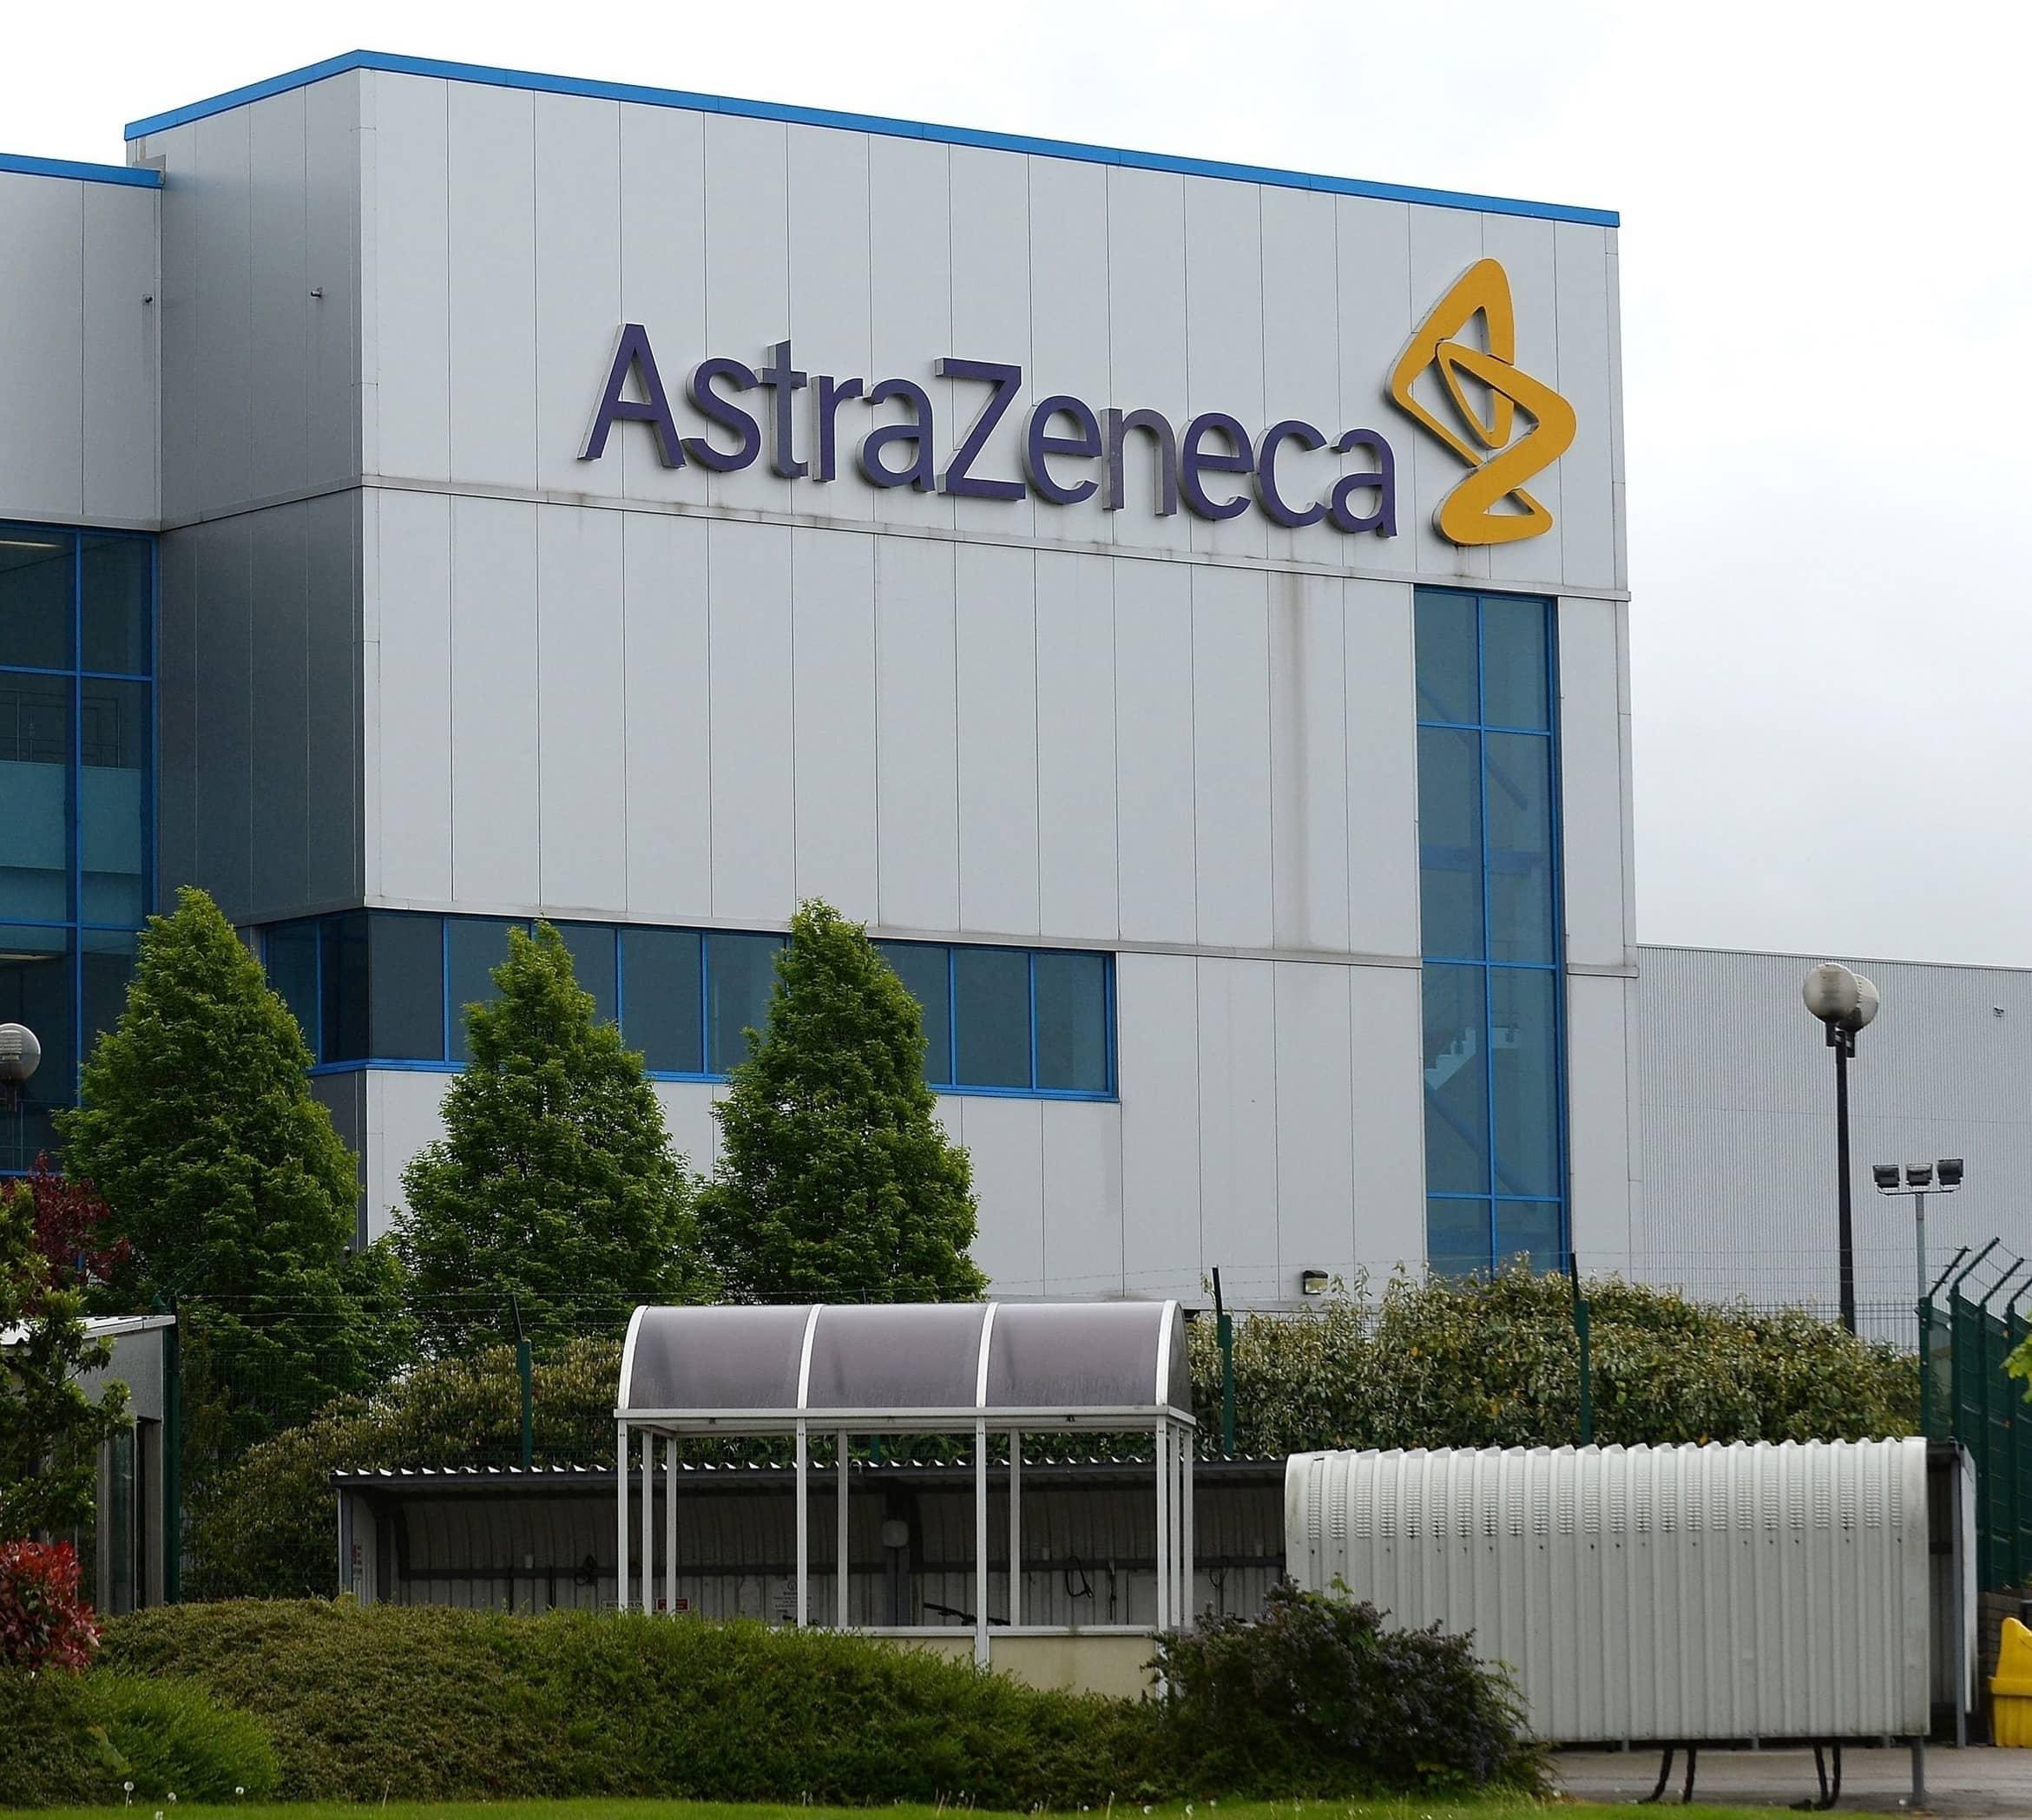 AstraZeneca Secures Orders For Virus Vaccine Under Testing